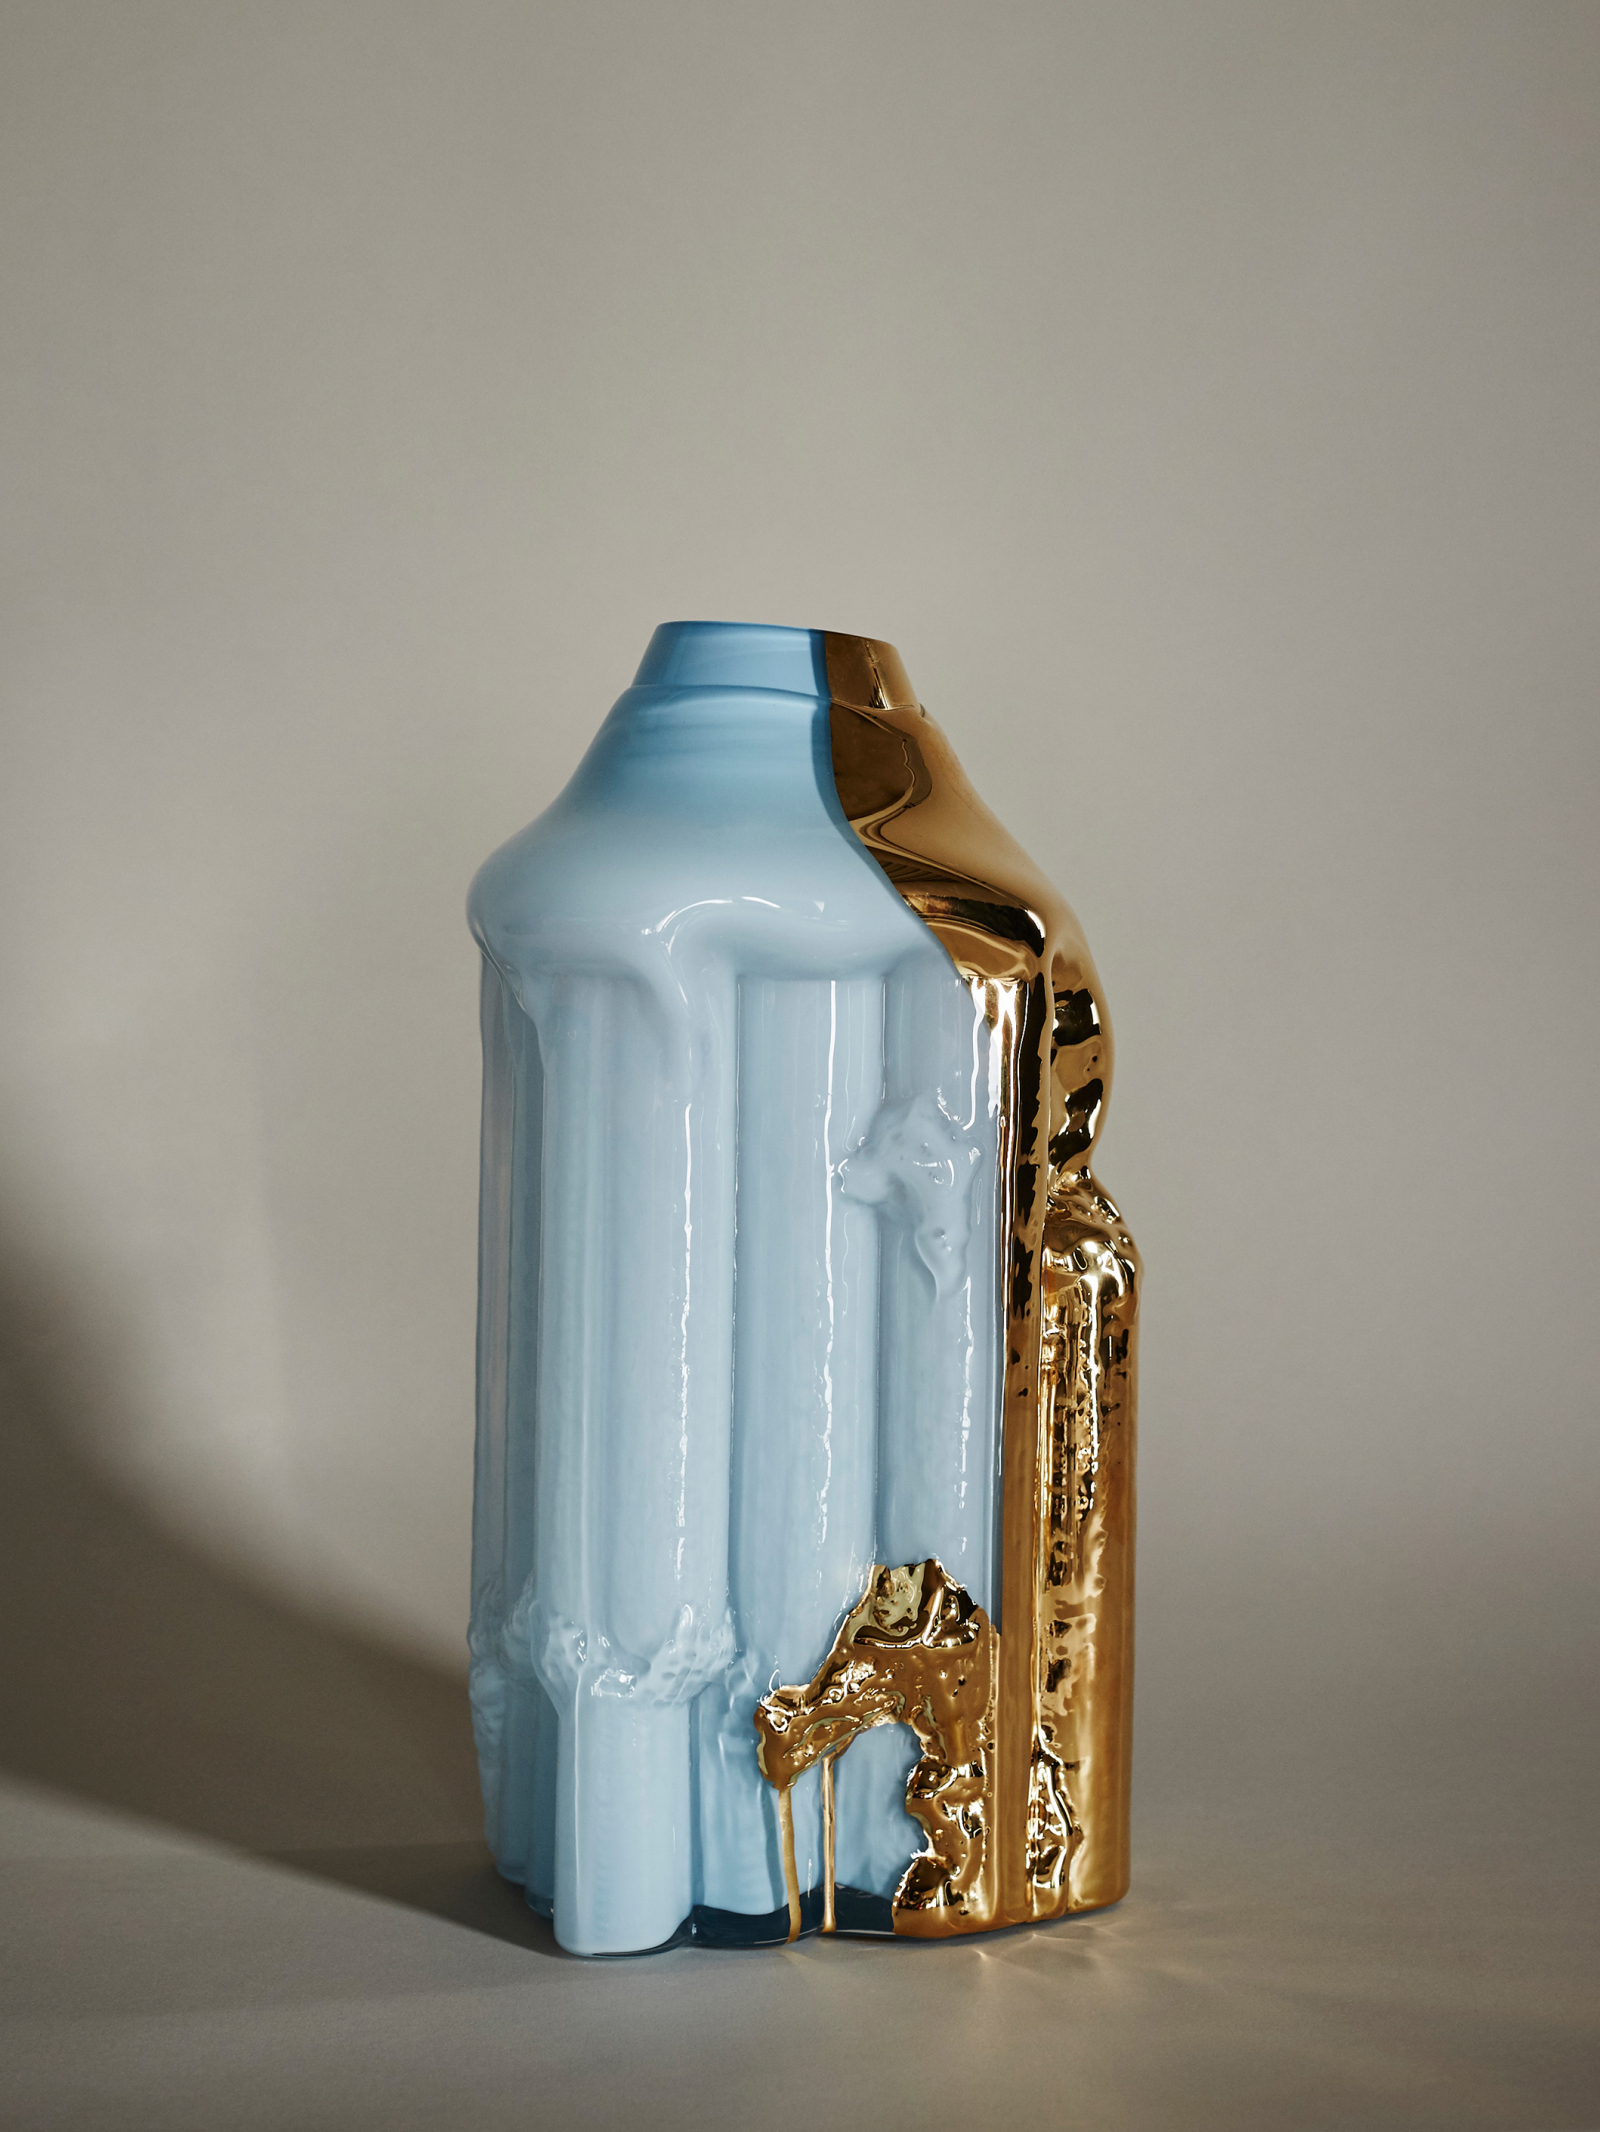 Golden Rain - Pale Blue - Hanna Hansdotter 18 000 SEK